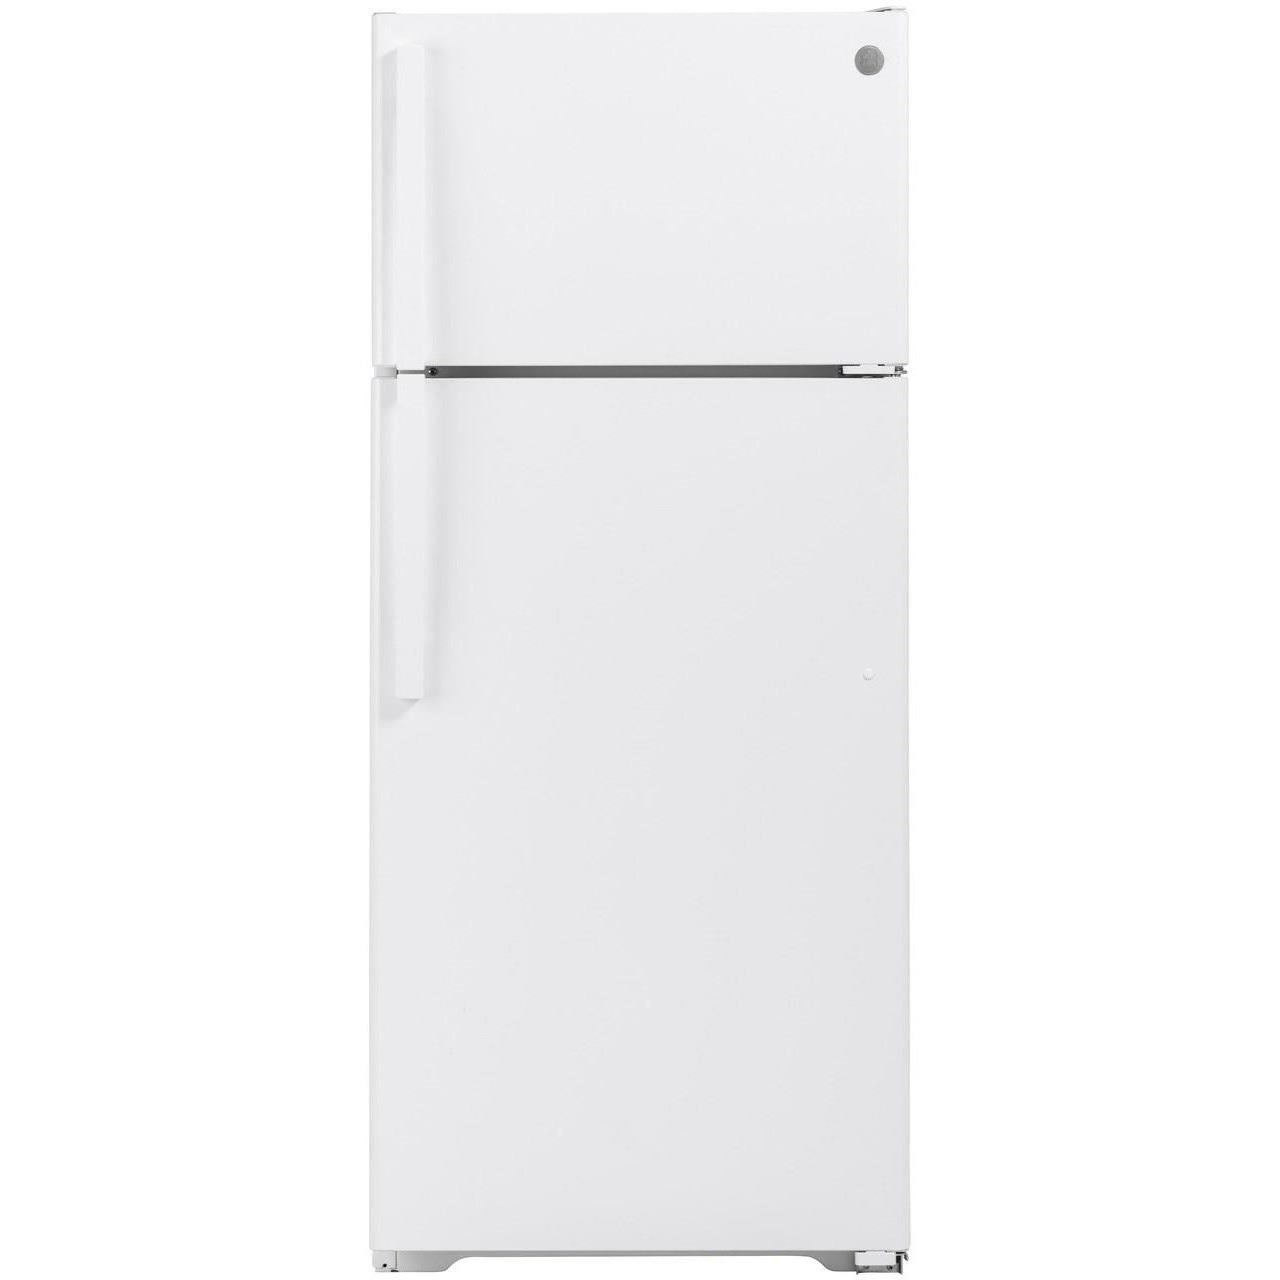 GE Top-Freezer Refrigerators GE® 17.5 Cu. Ft. Top-Freezer Refrigerator by GE Appliances at Furniture Fair - North Carolina